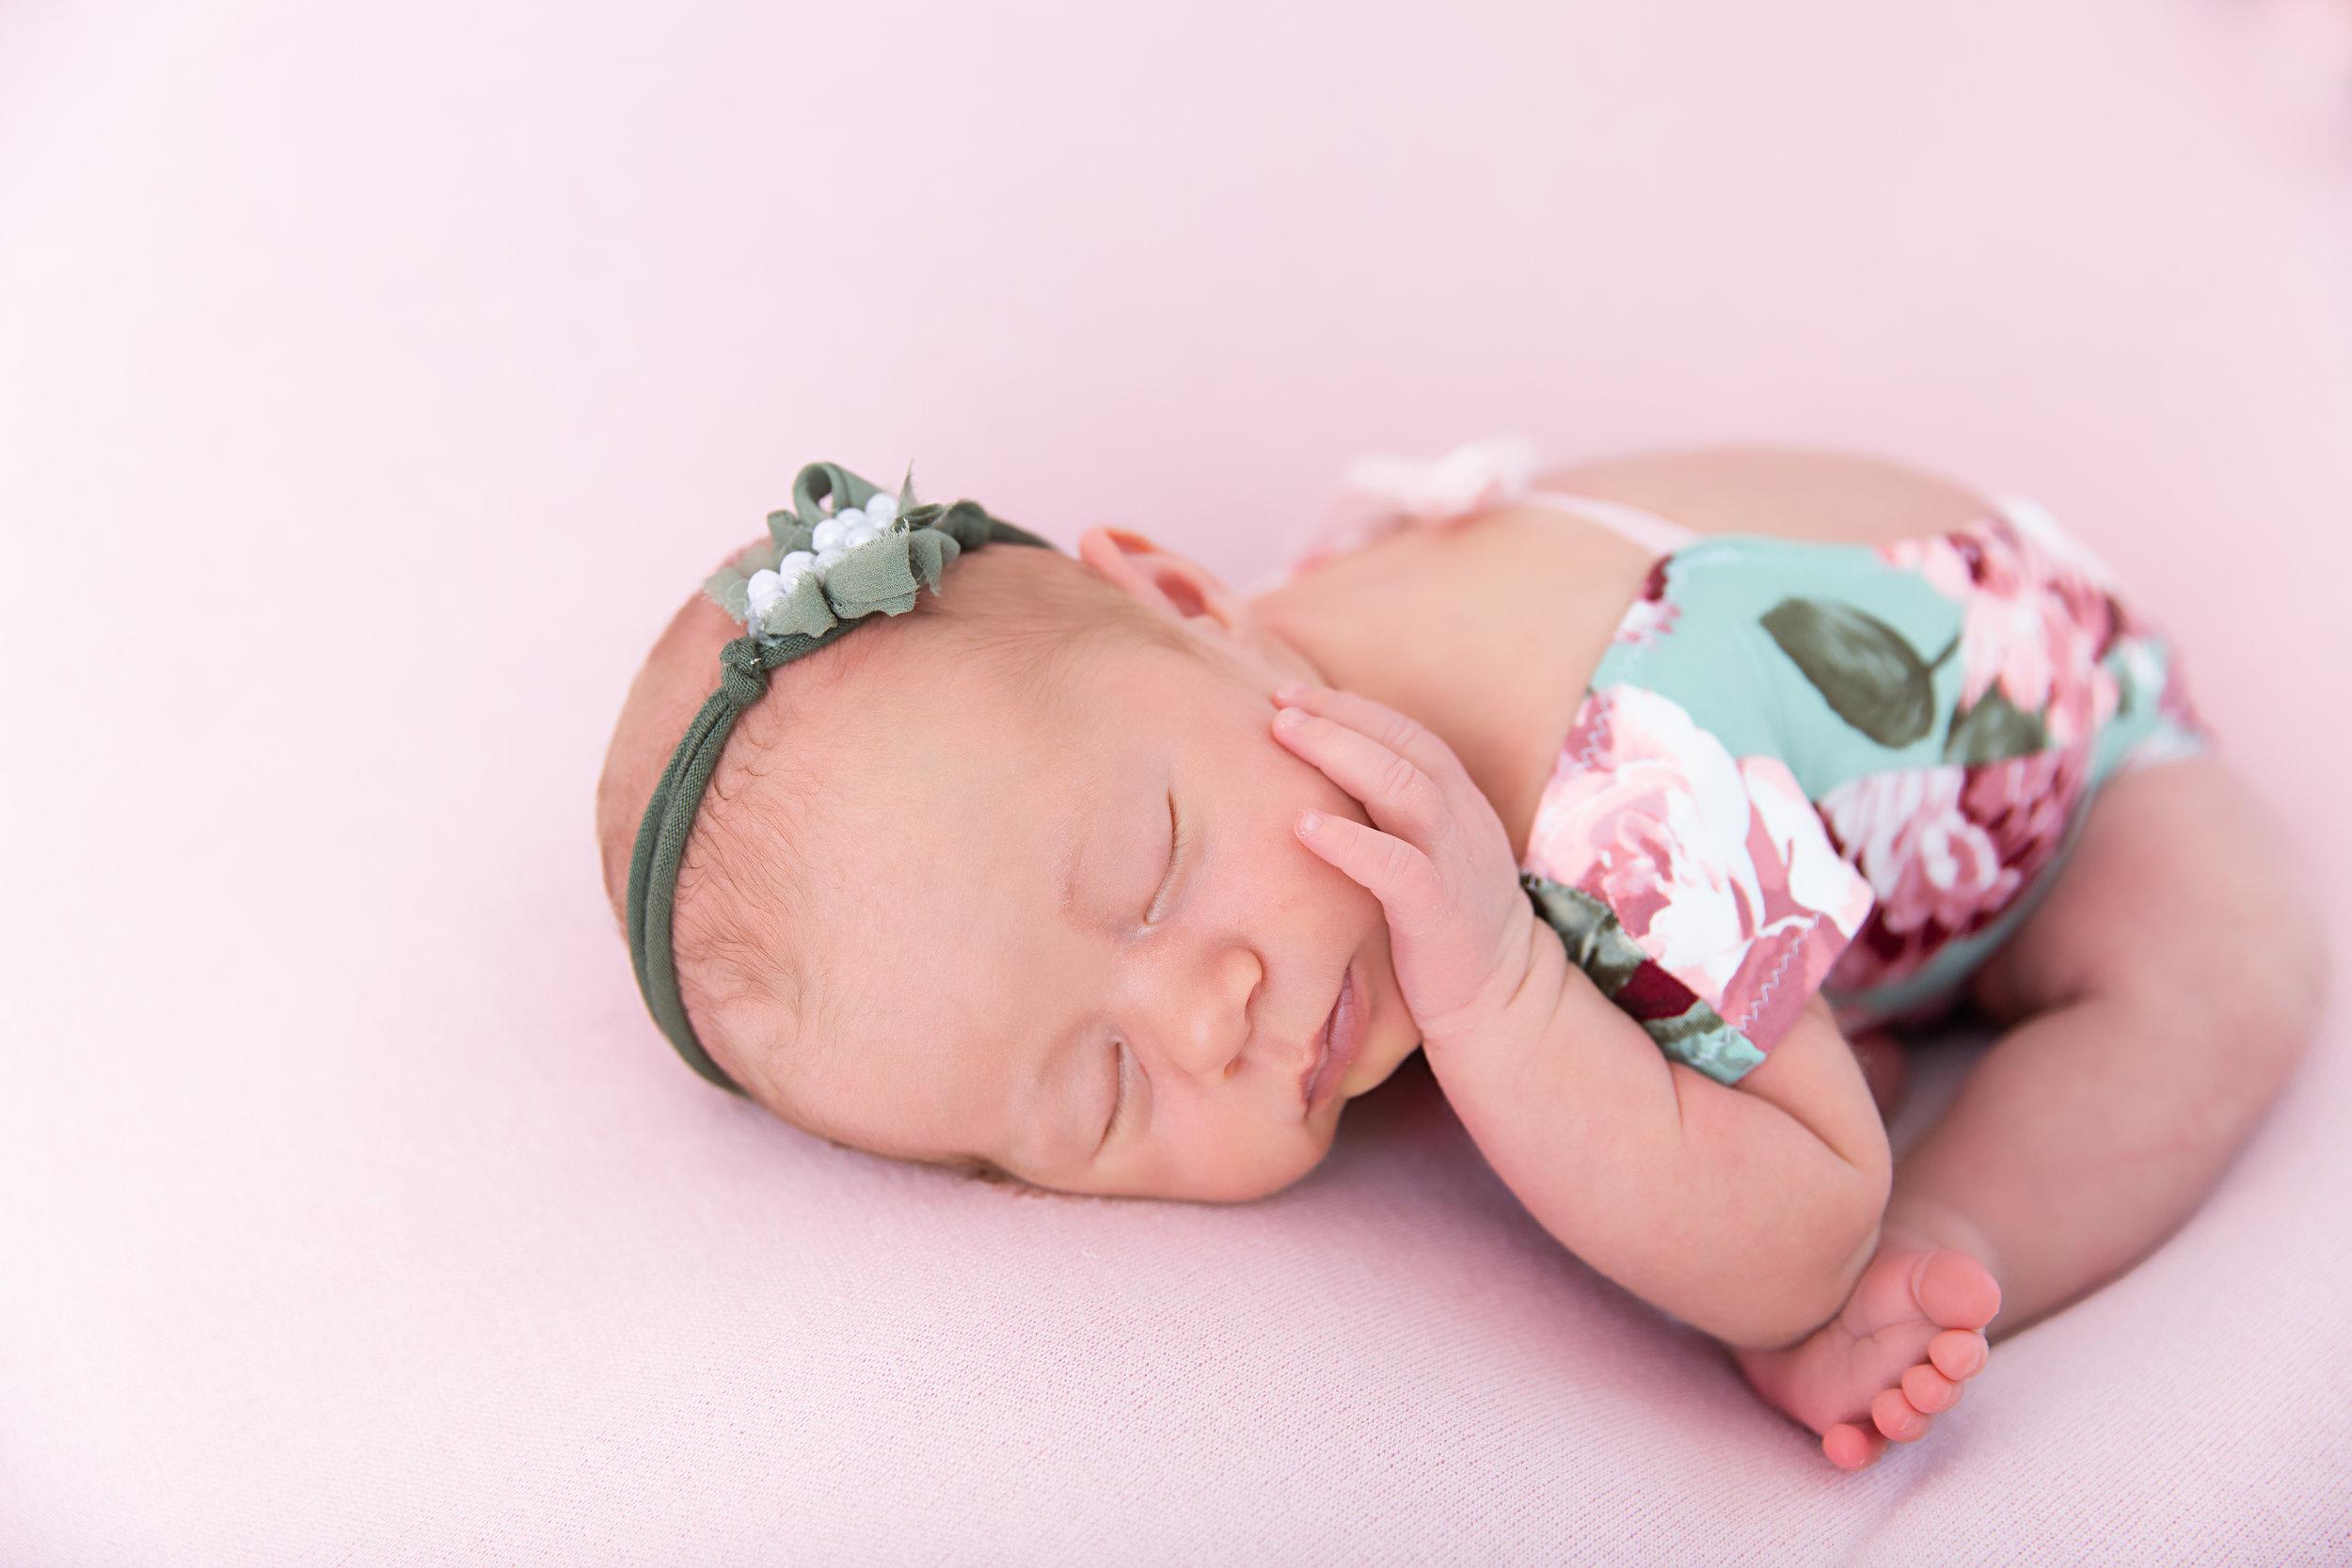 posed sleeping newborn baby